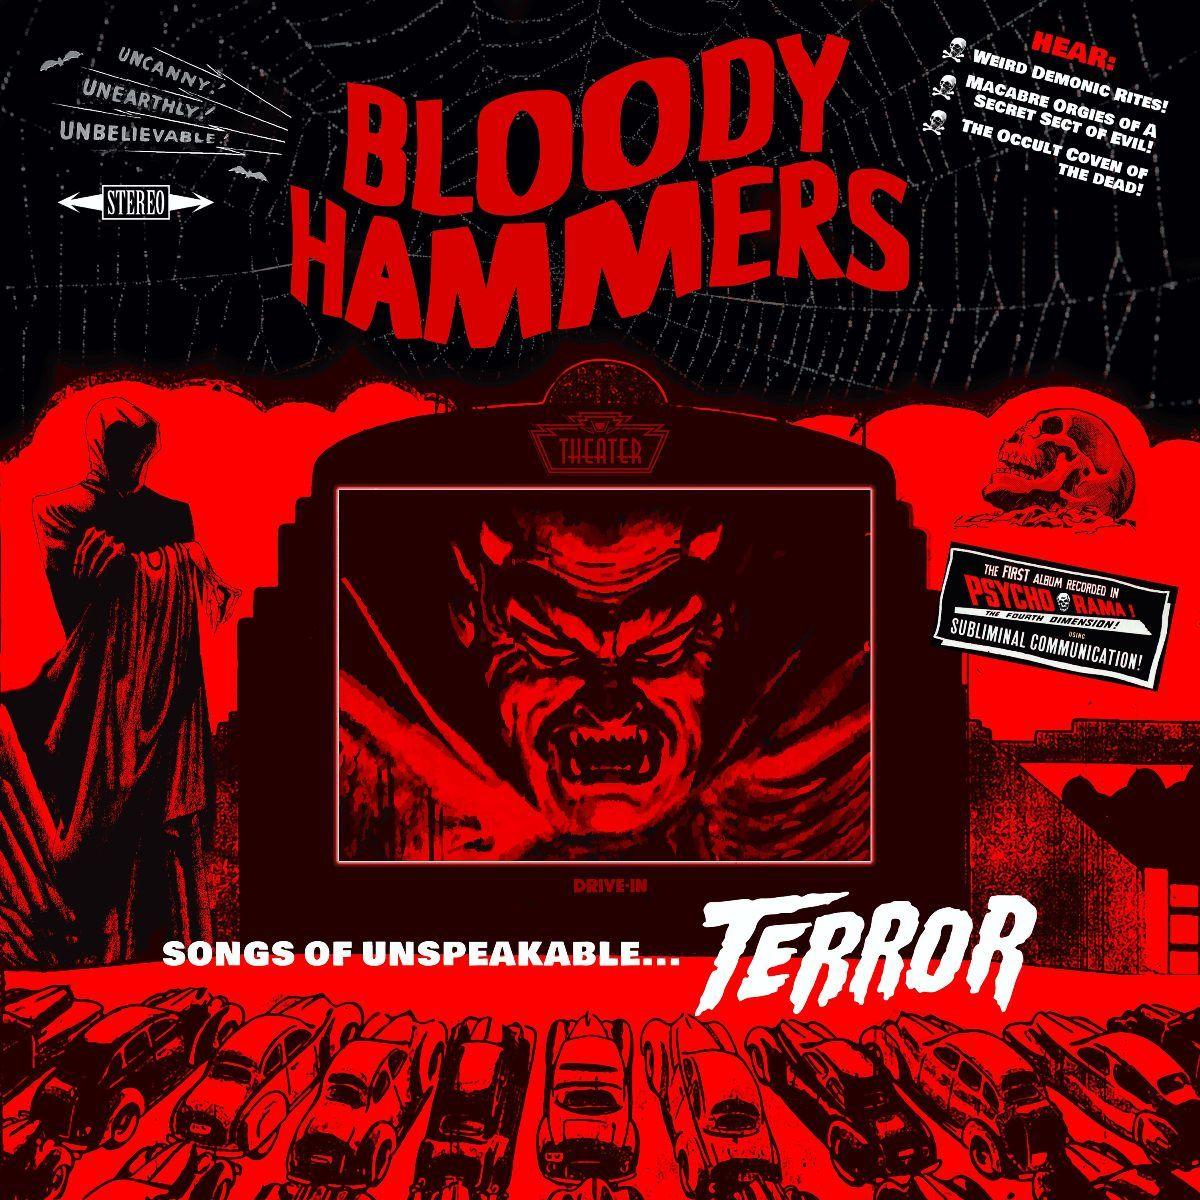 bloody hammers - songs of unspeakable terror - album cover